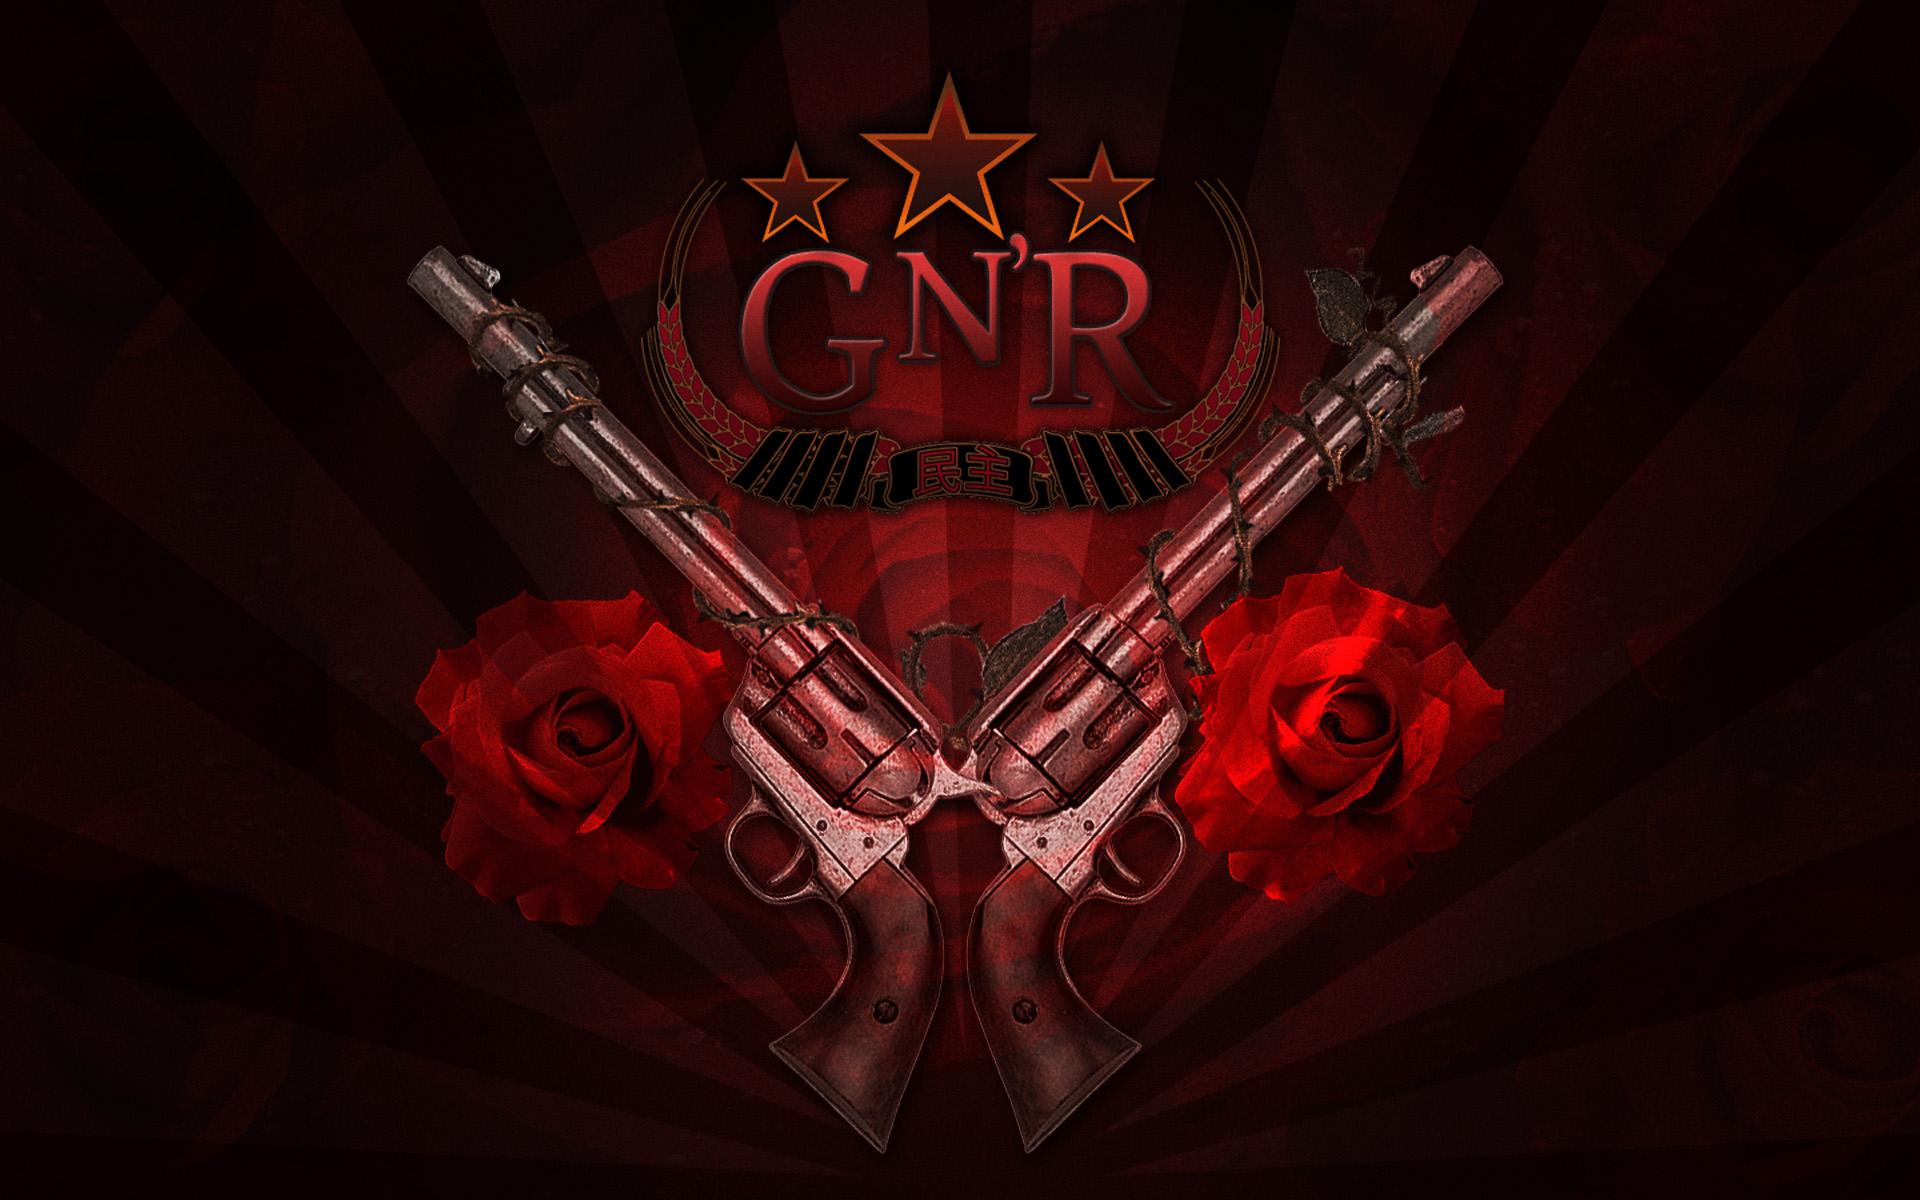 Gun Wallpaper Android Download: Guns N Roses Wallpaper Android